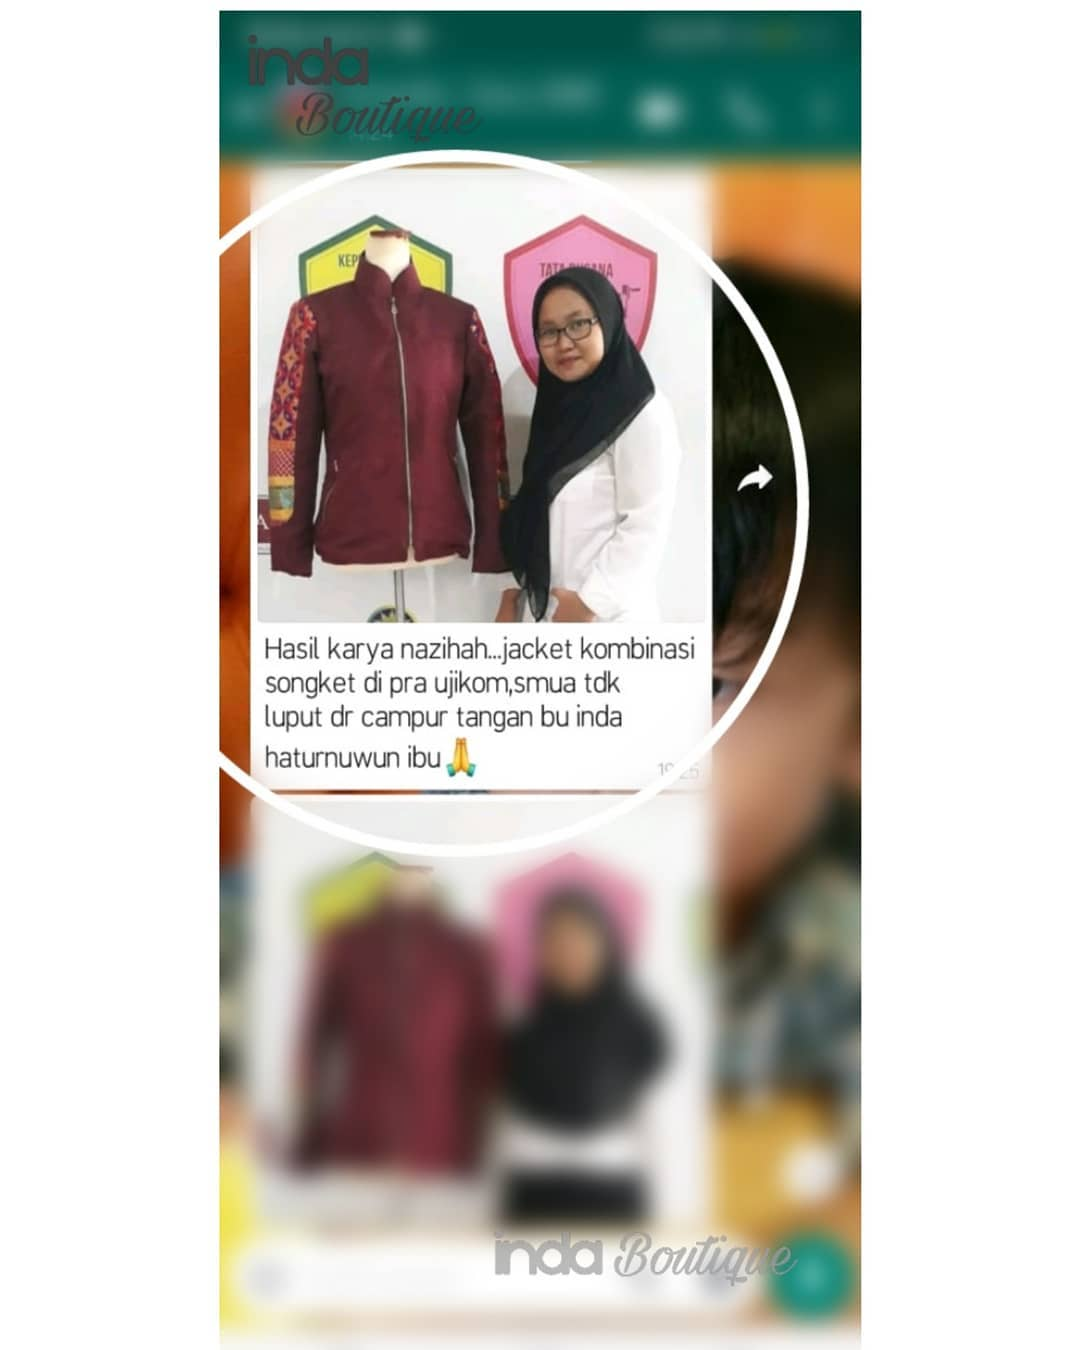 Testimoni dari Guru SMK Muhammadiyah 4 Cileungsi